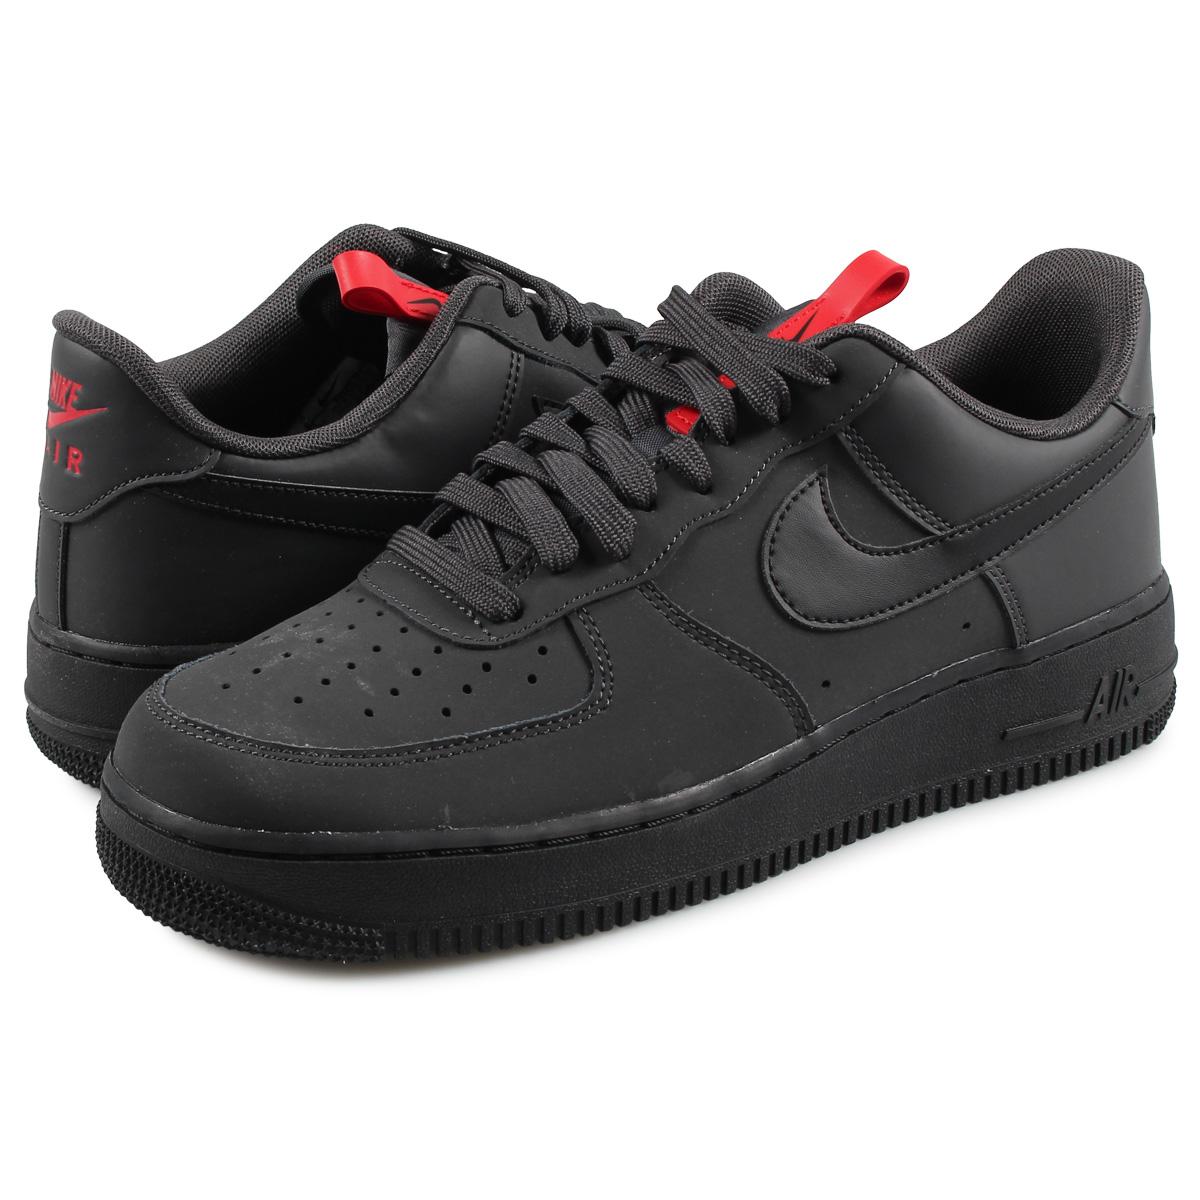 Nike NIKE air force 1 sneakers men AIR FORCE 1 07 black black BQ4326 001 [1010 Shinnyu load] [199]